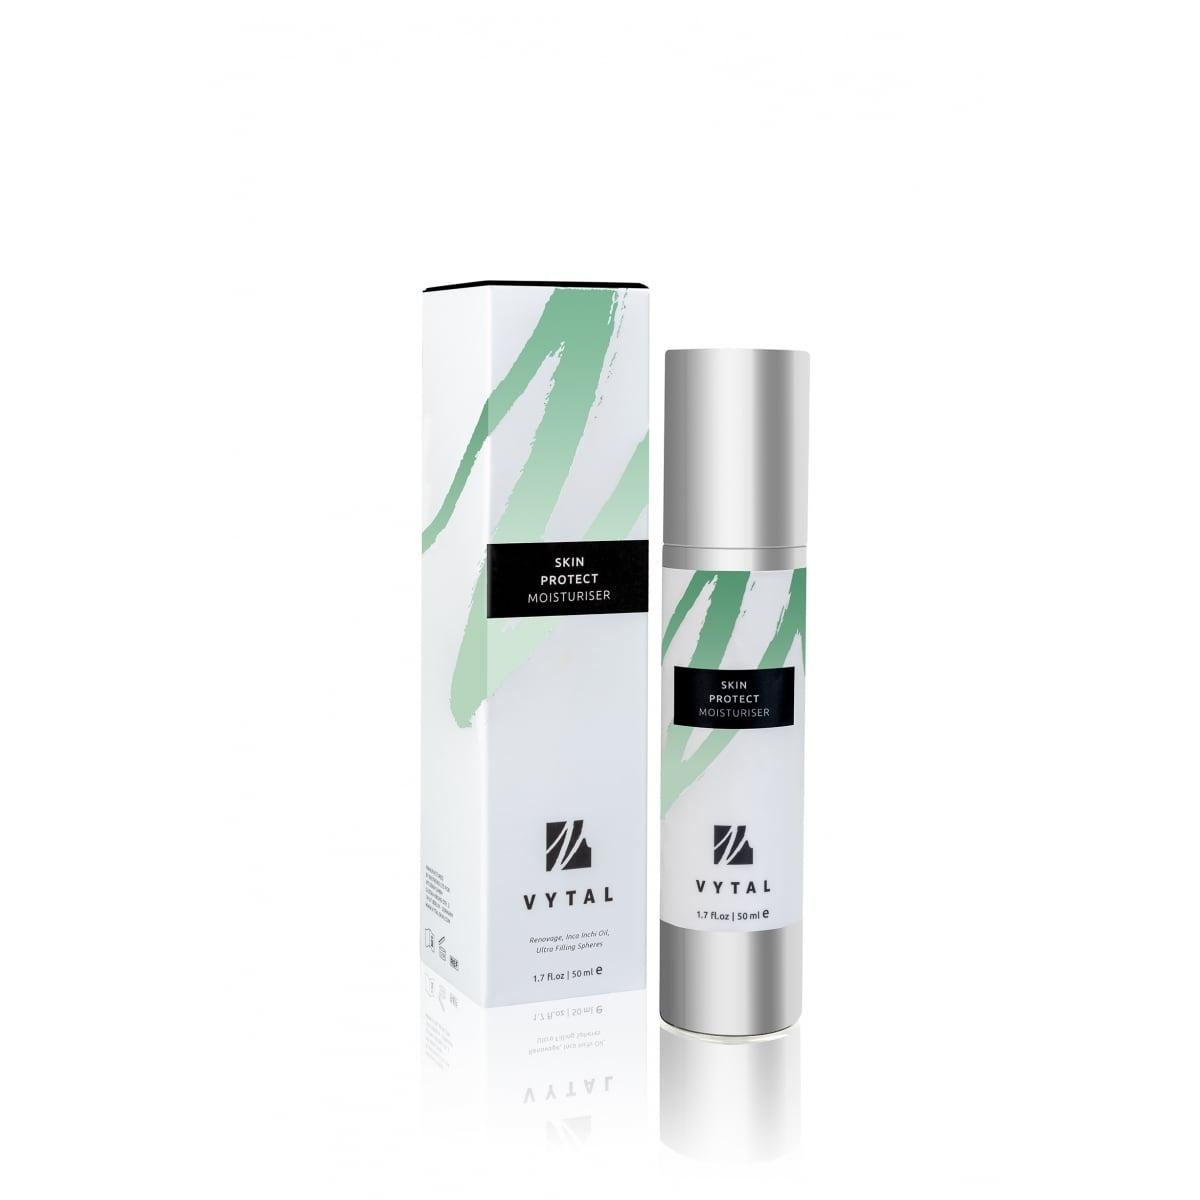 Soins beauté - Vytal Skin - SKIN PROTECT MOISTURISER (50 ml)